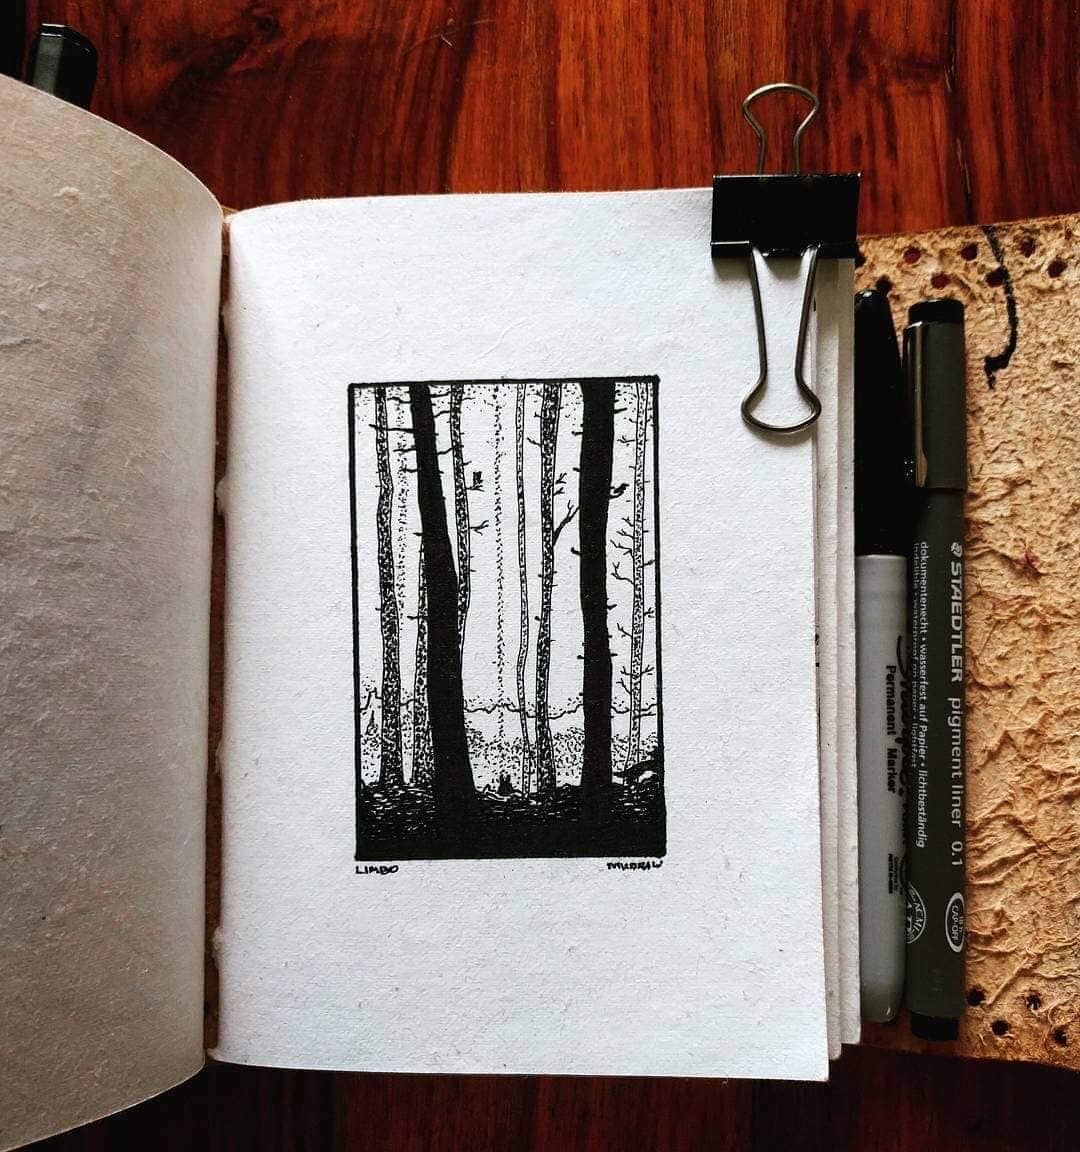 🌲 • •• ••• •••• #doodle #art #illustrator #illustration #sketch #sketchbook #instaart #drawing #blackworkers #draw #bw #artpostdaily #dailydrawoff #blackworkers #ink #dotwork #lineworktattoo #tattoo #illustrative #iblackwork #mountainart #рисунок #trees #sharpie #sketching #comics #darkness #woods #limbo #onedrawingaday